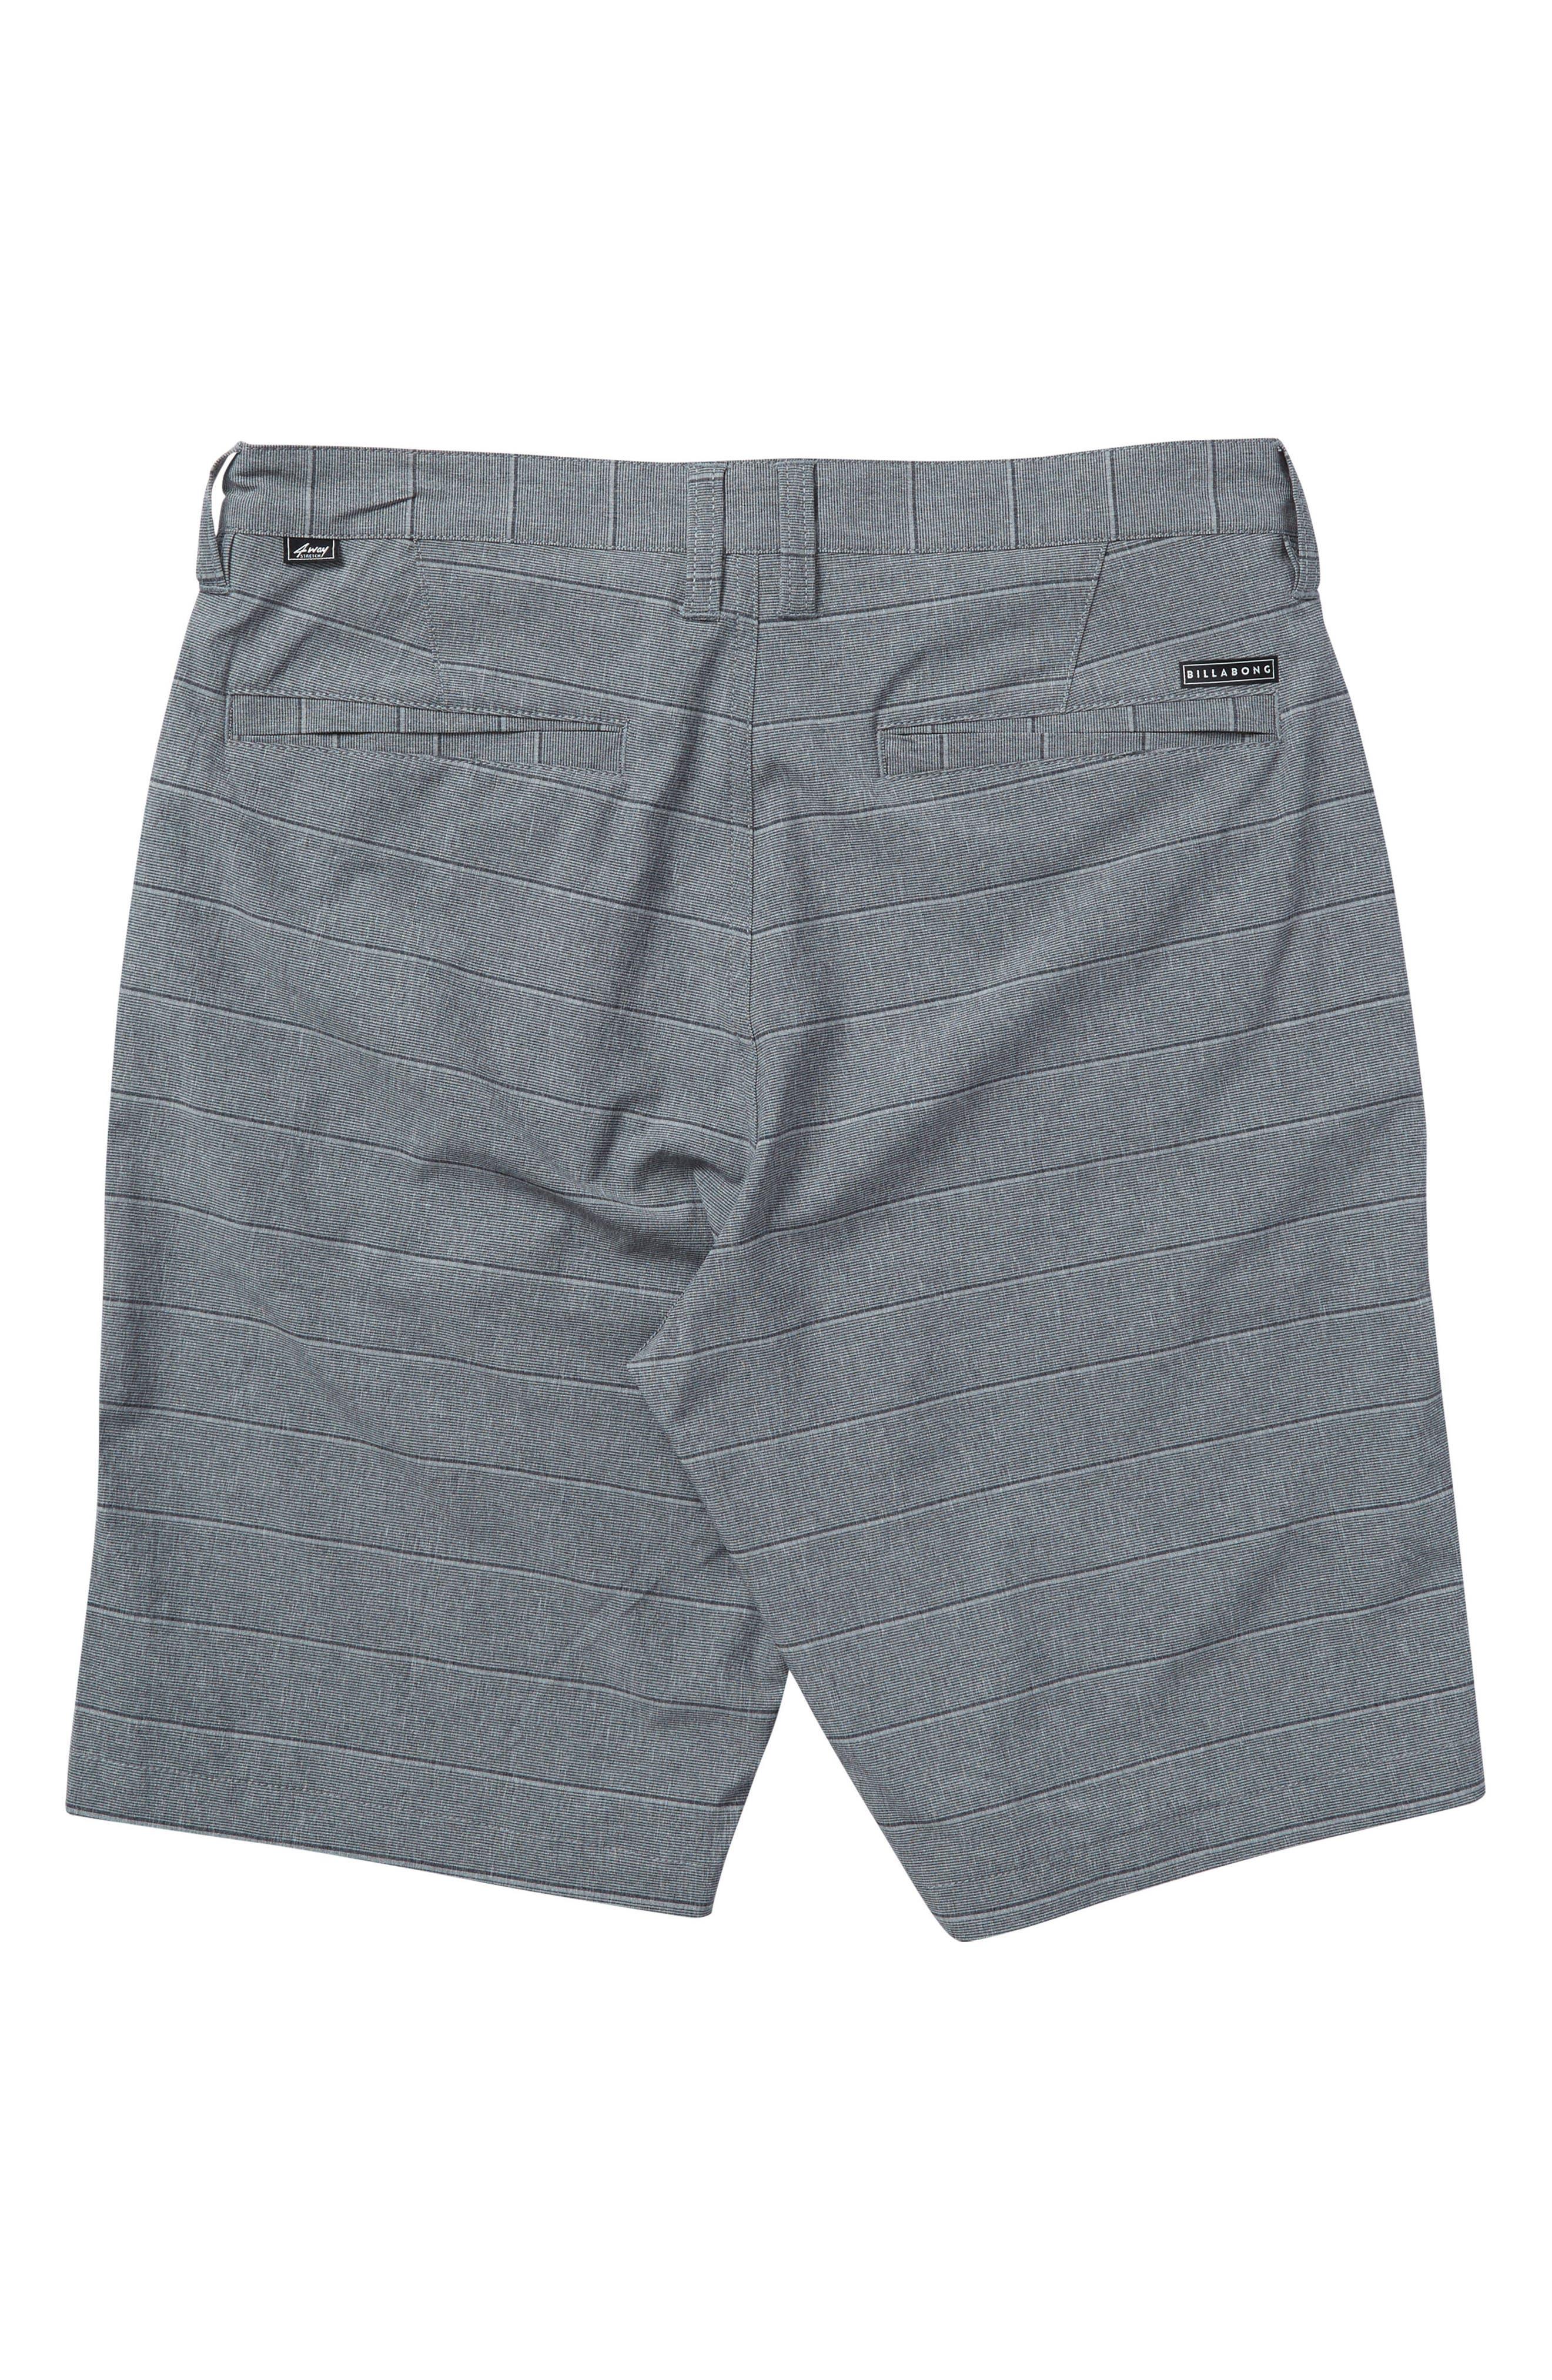 Crossfire X Stripe Hybrid Shorts,                             Alternate thumbnail 2, color,                             Dark Grey